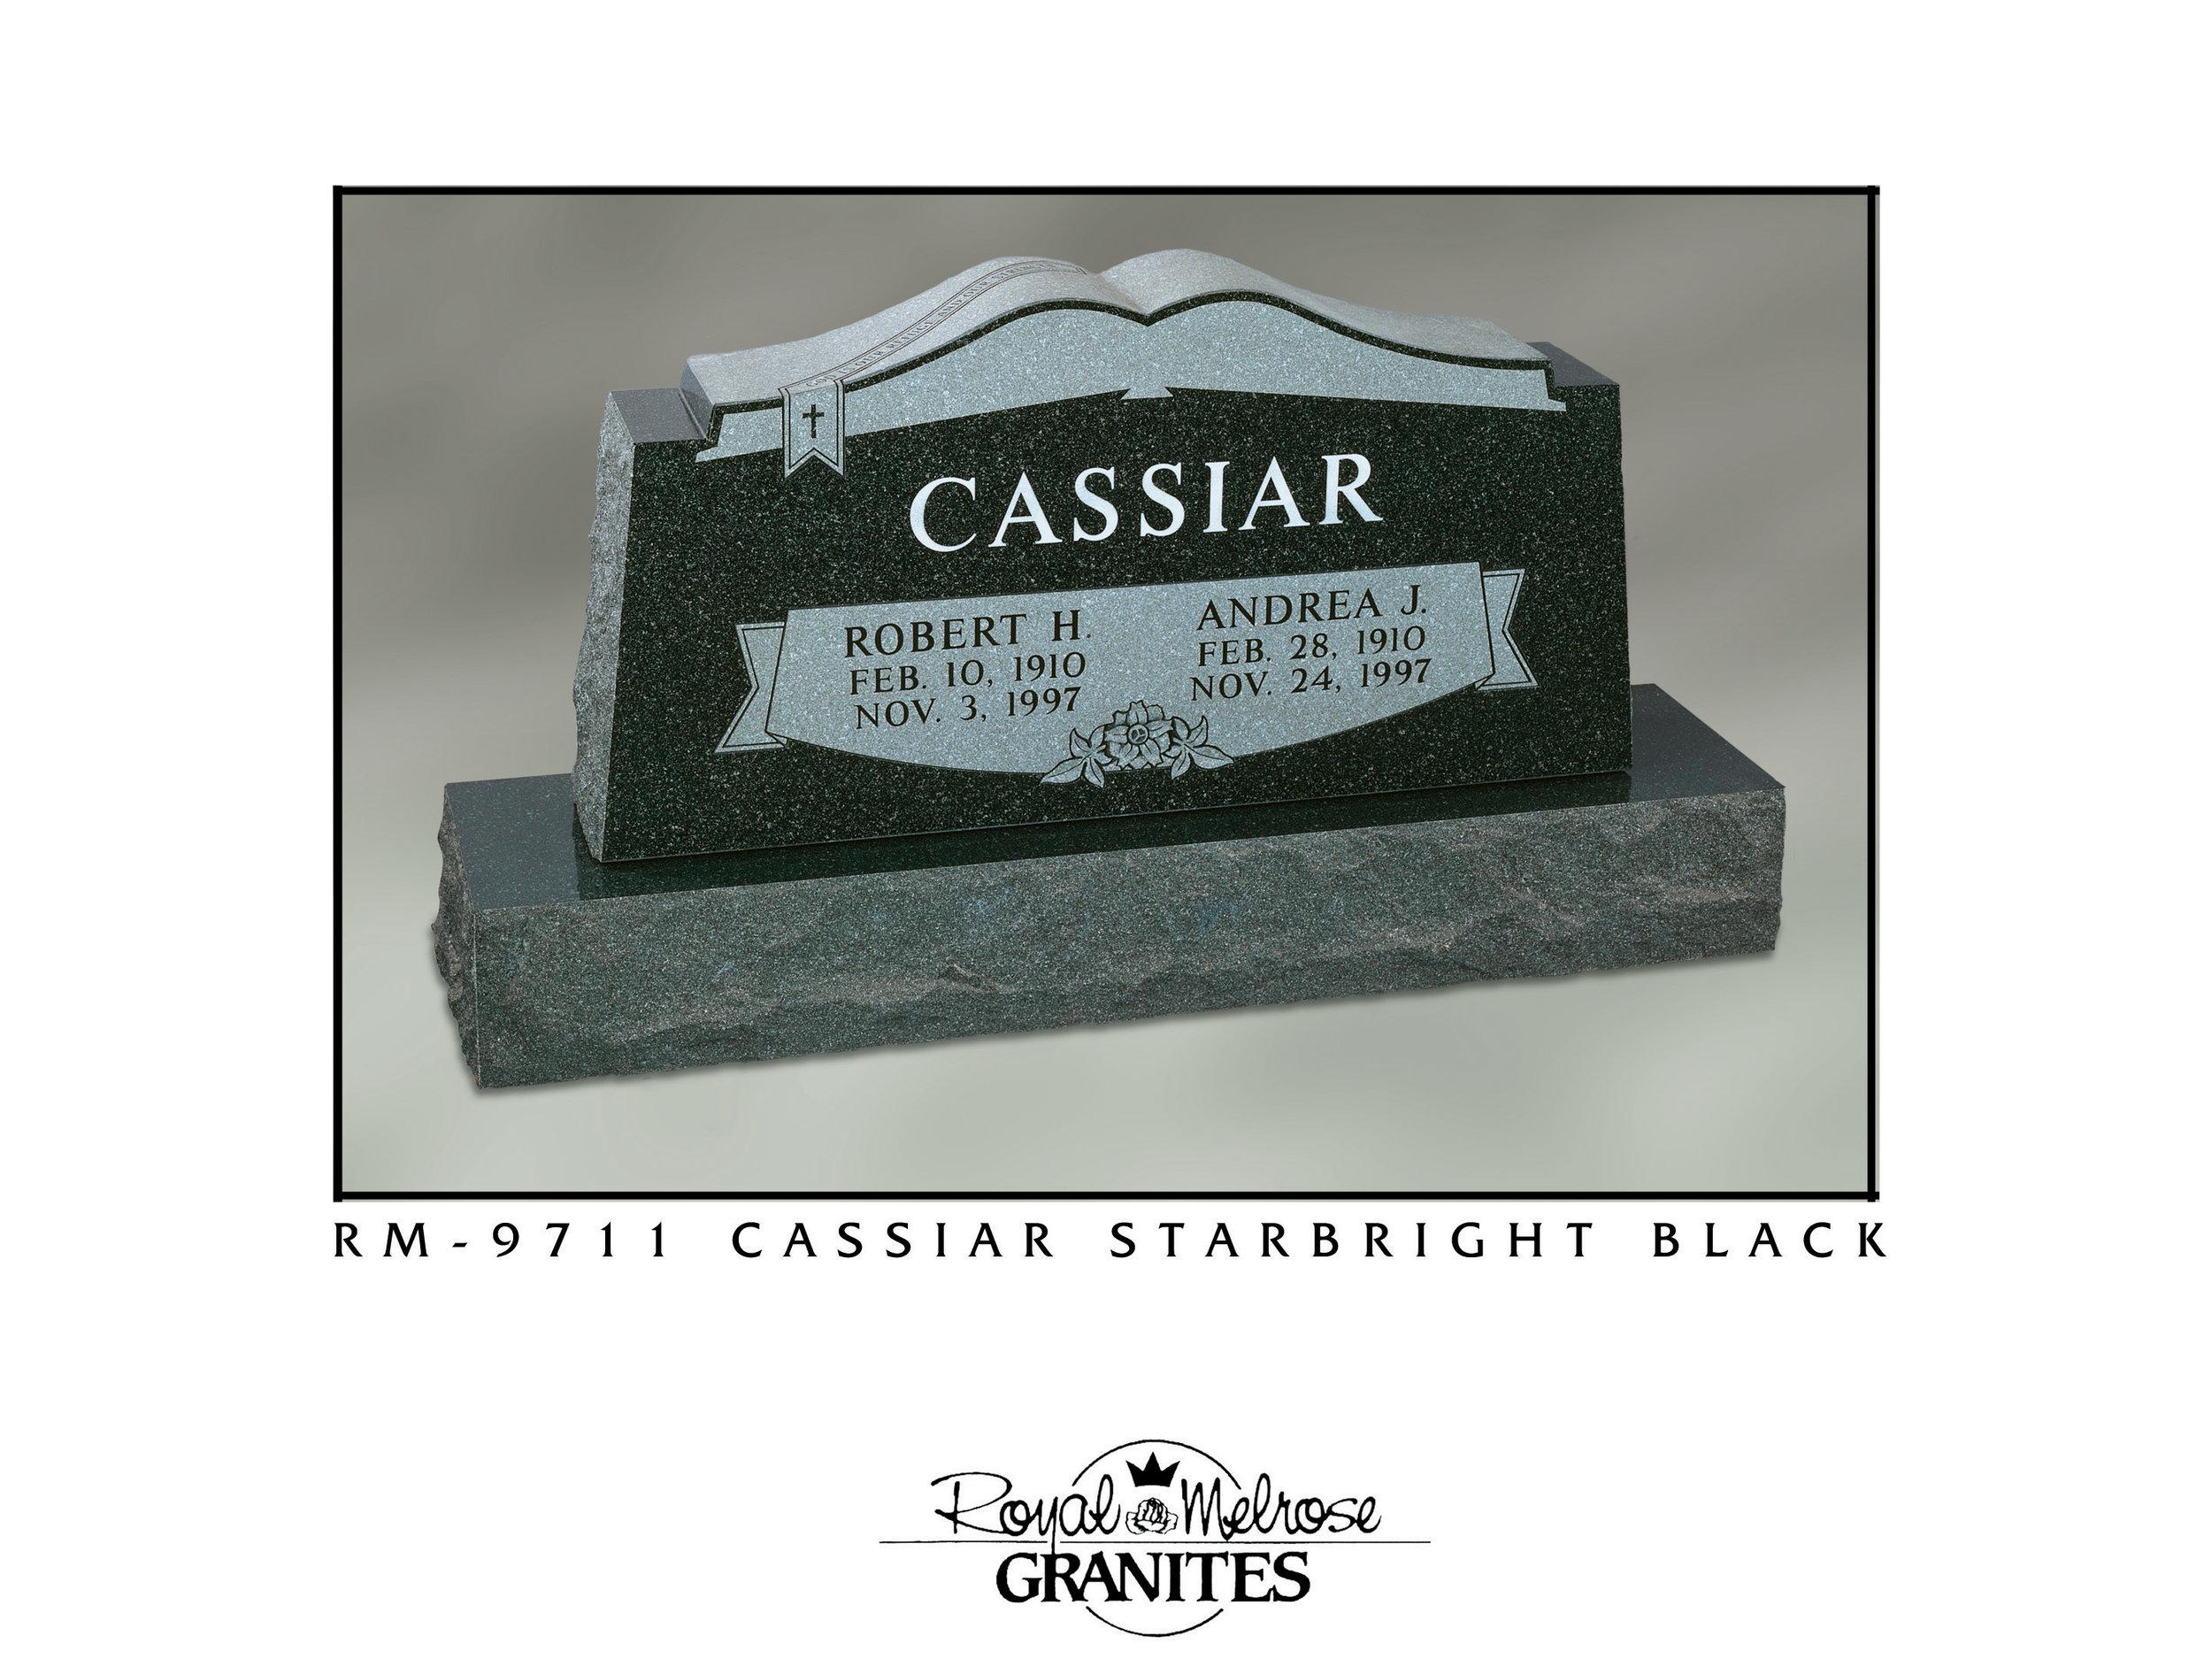 RM-9711 Cassiar -starbright blk.jpg